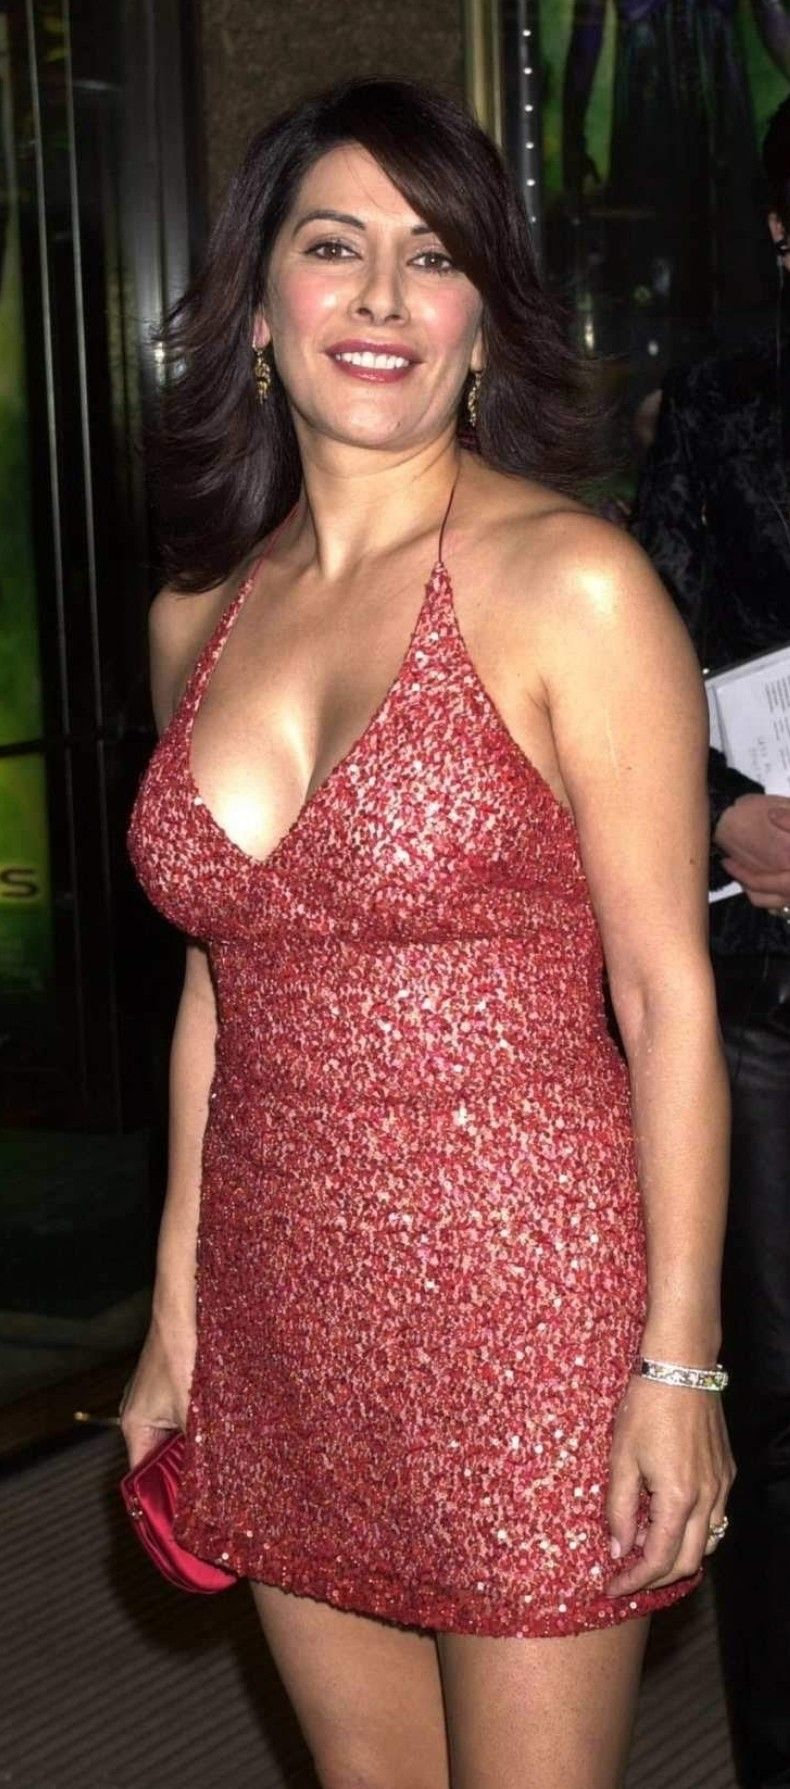 Jenny taft topless